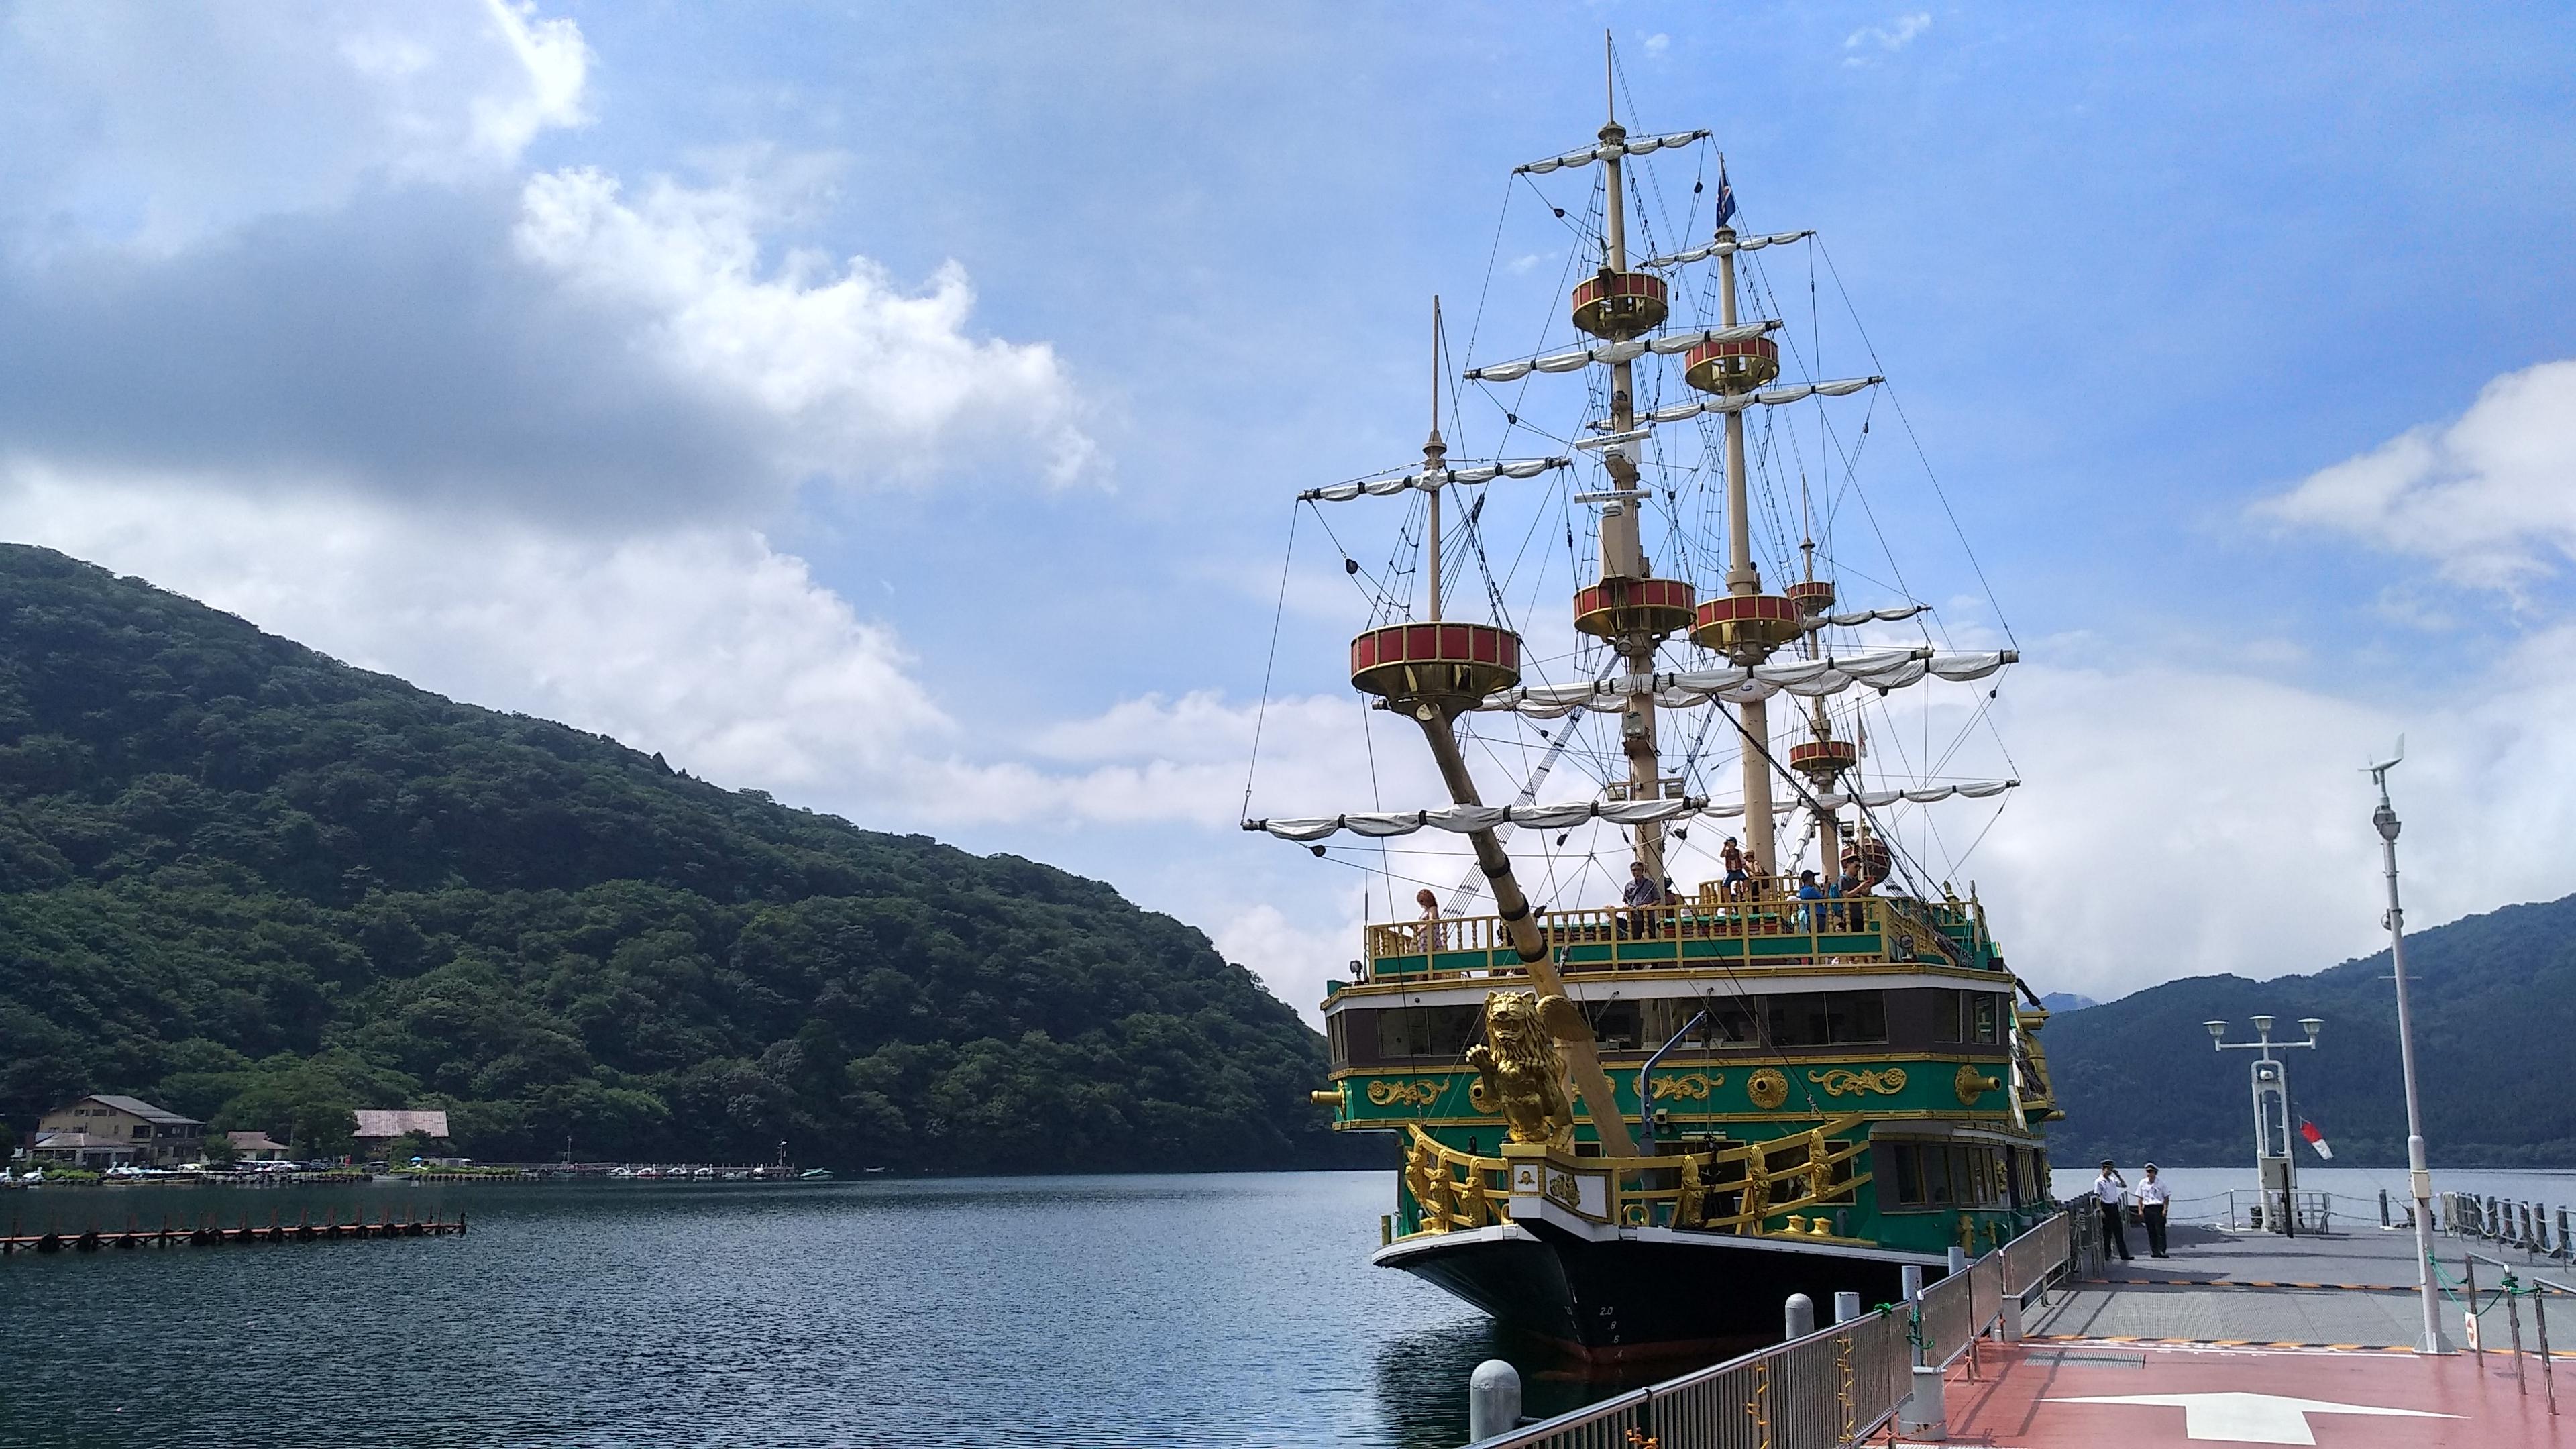 File:Pirate Ship on Lake Ashinoko July 2018 jpg - Wikimedia Commons